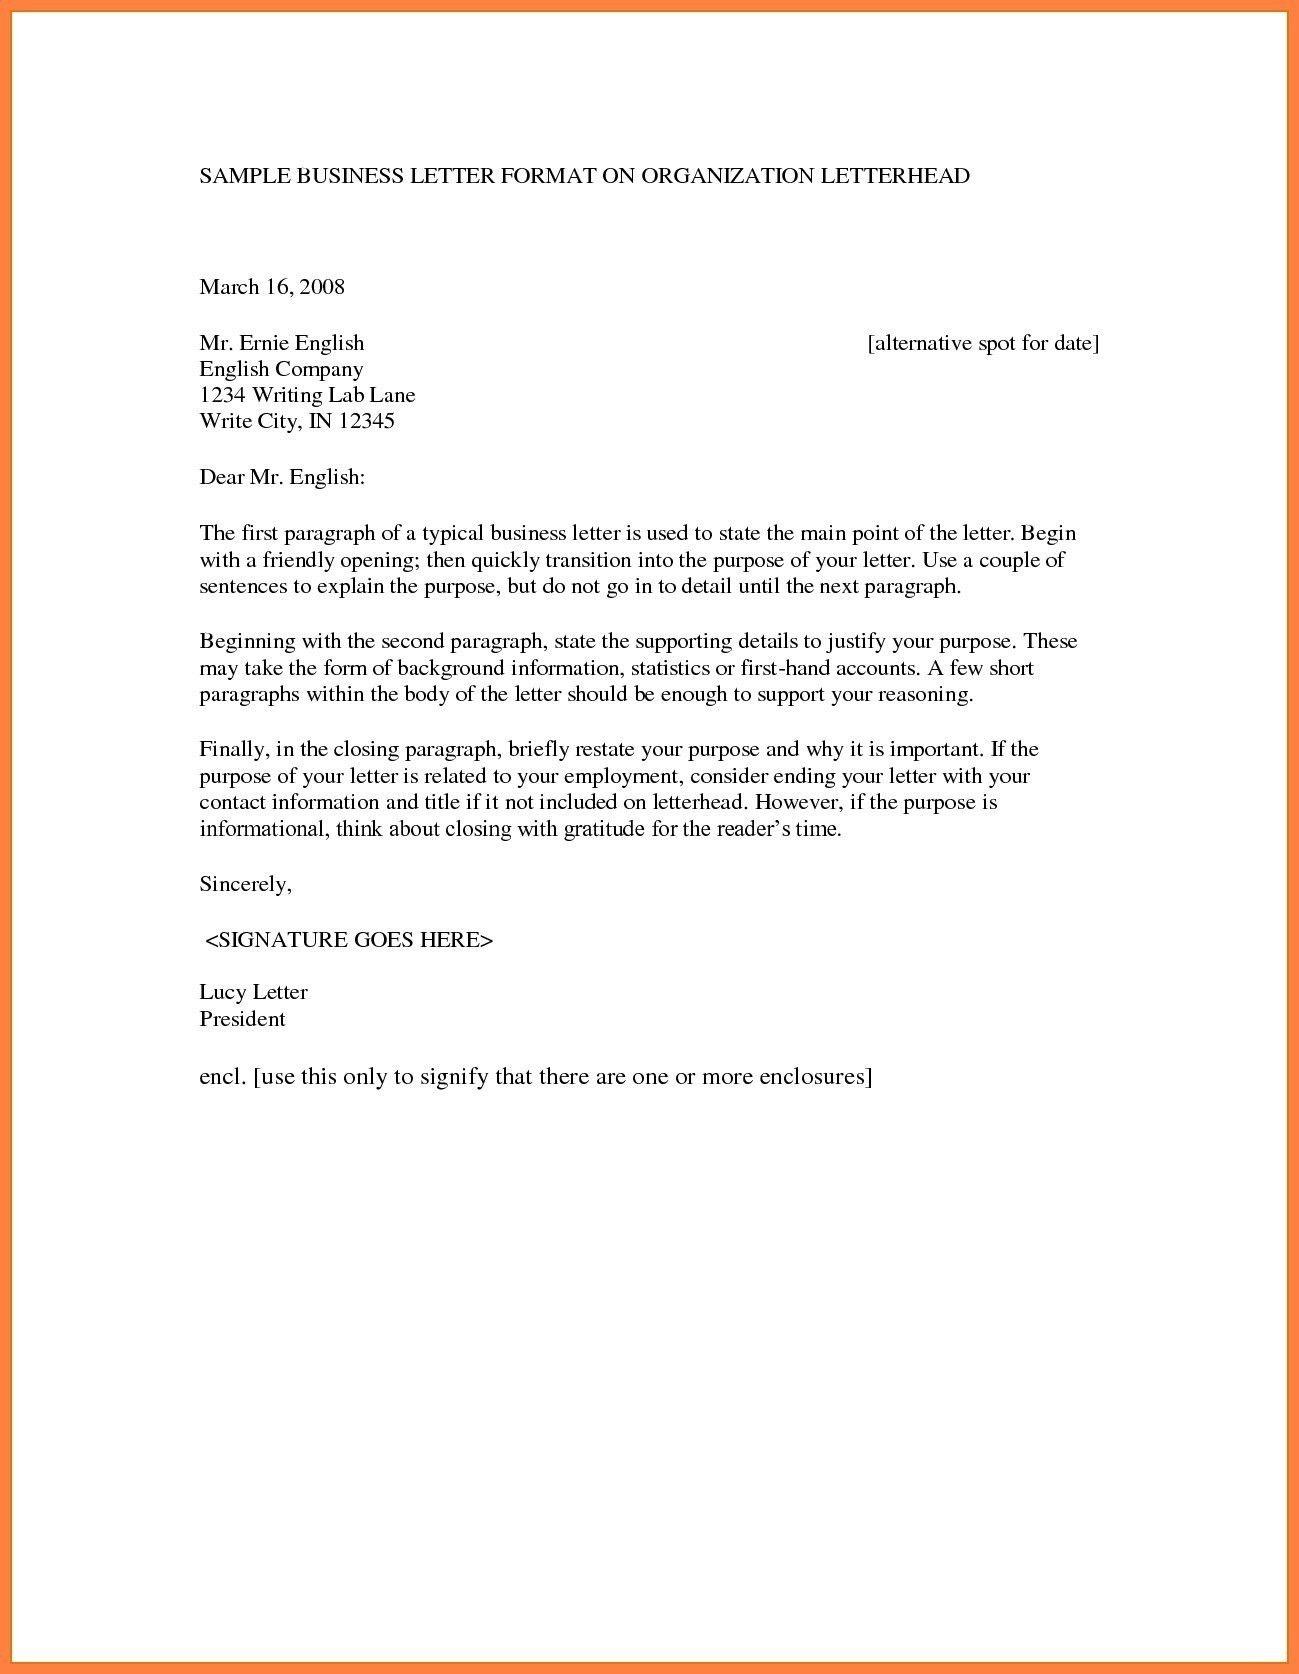 Download Fresh Letterhead Text Sample Pdf at https